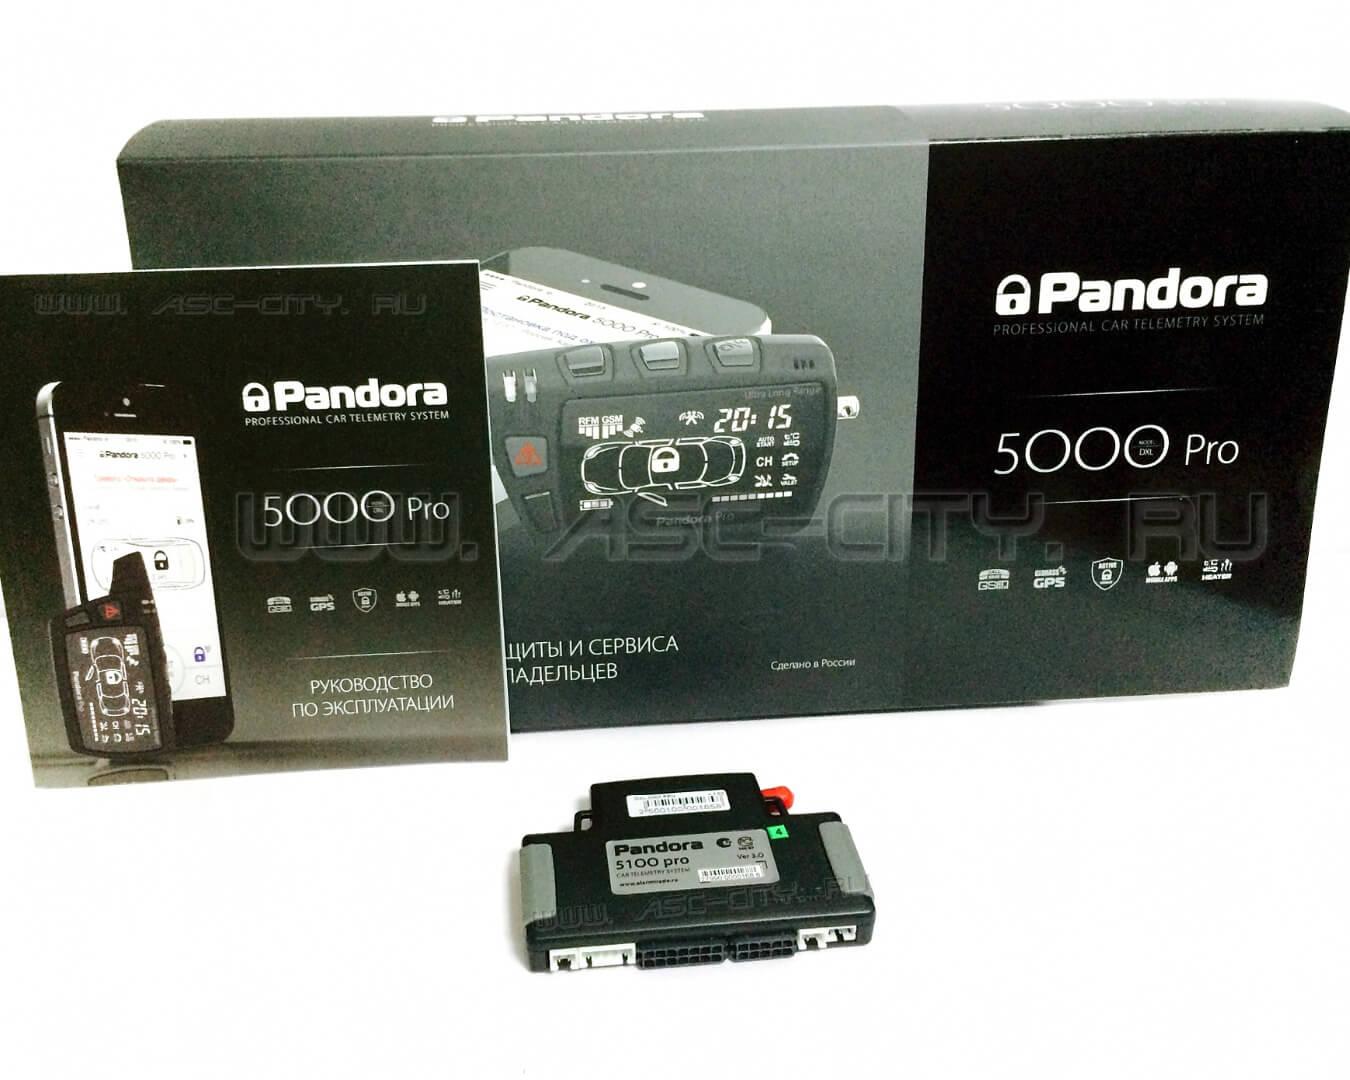 Pandora 5000 PRO